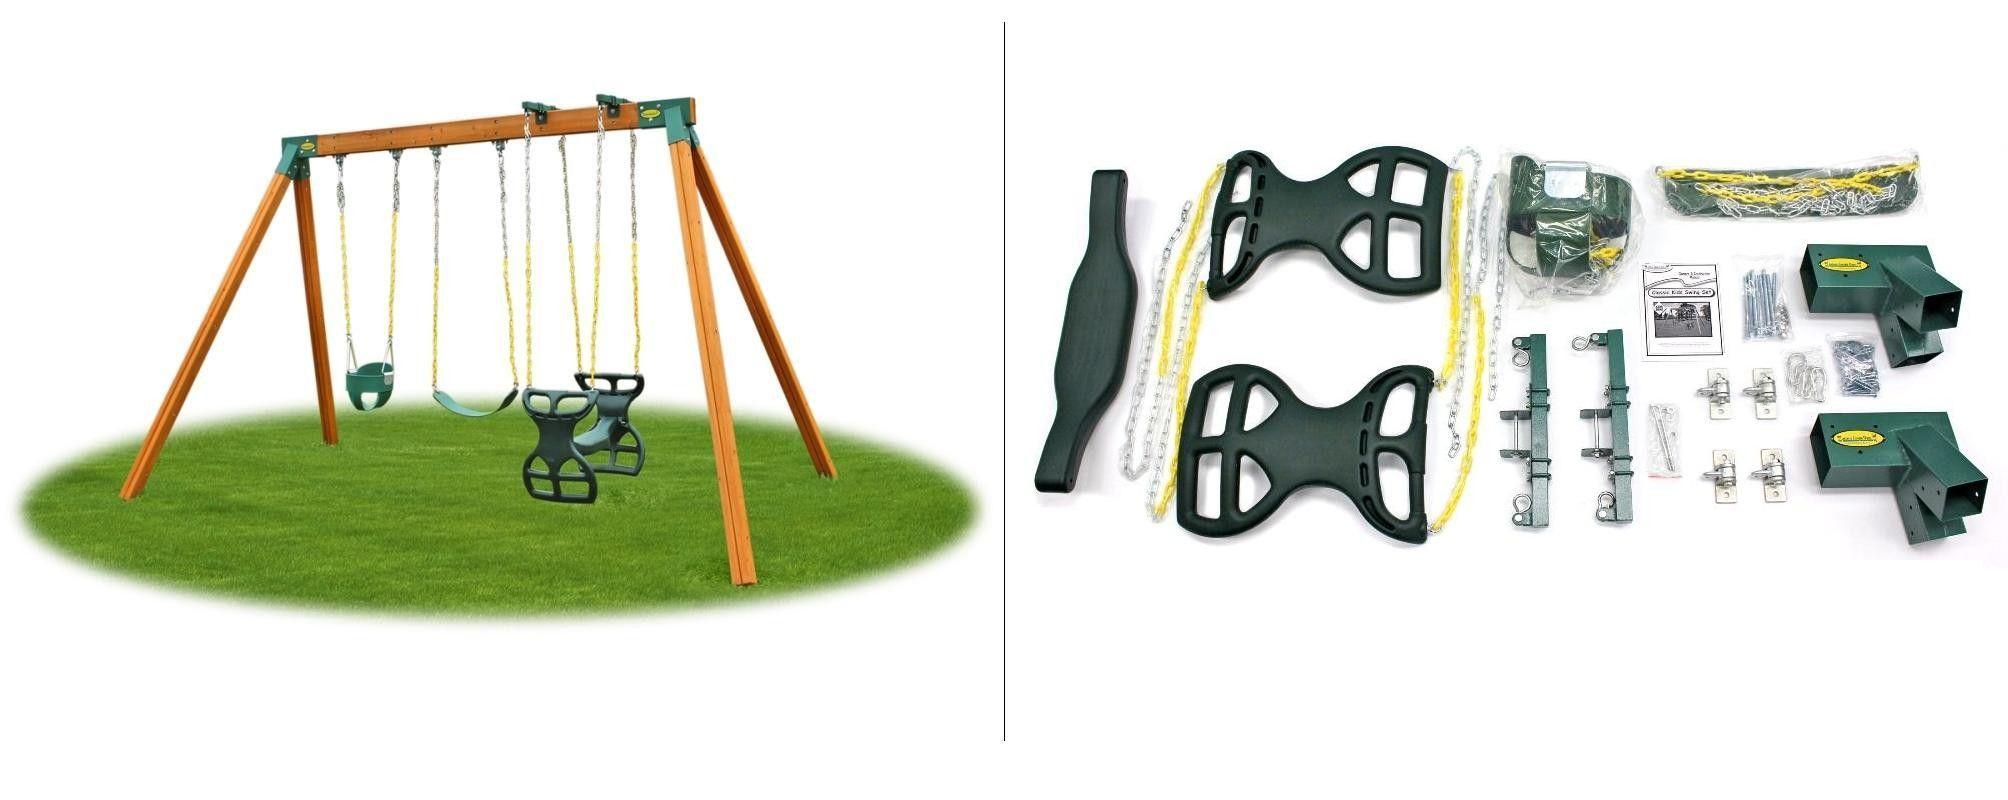 Classic kids swing set hardware kit swing sets for kids